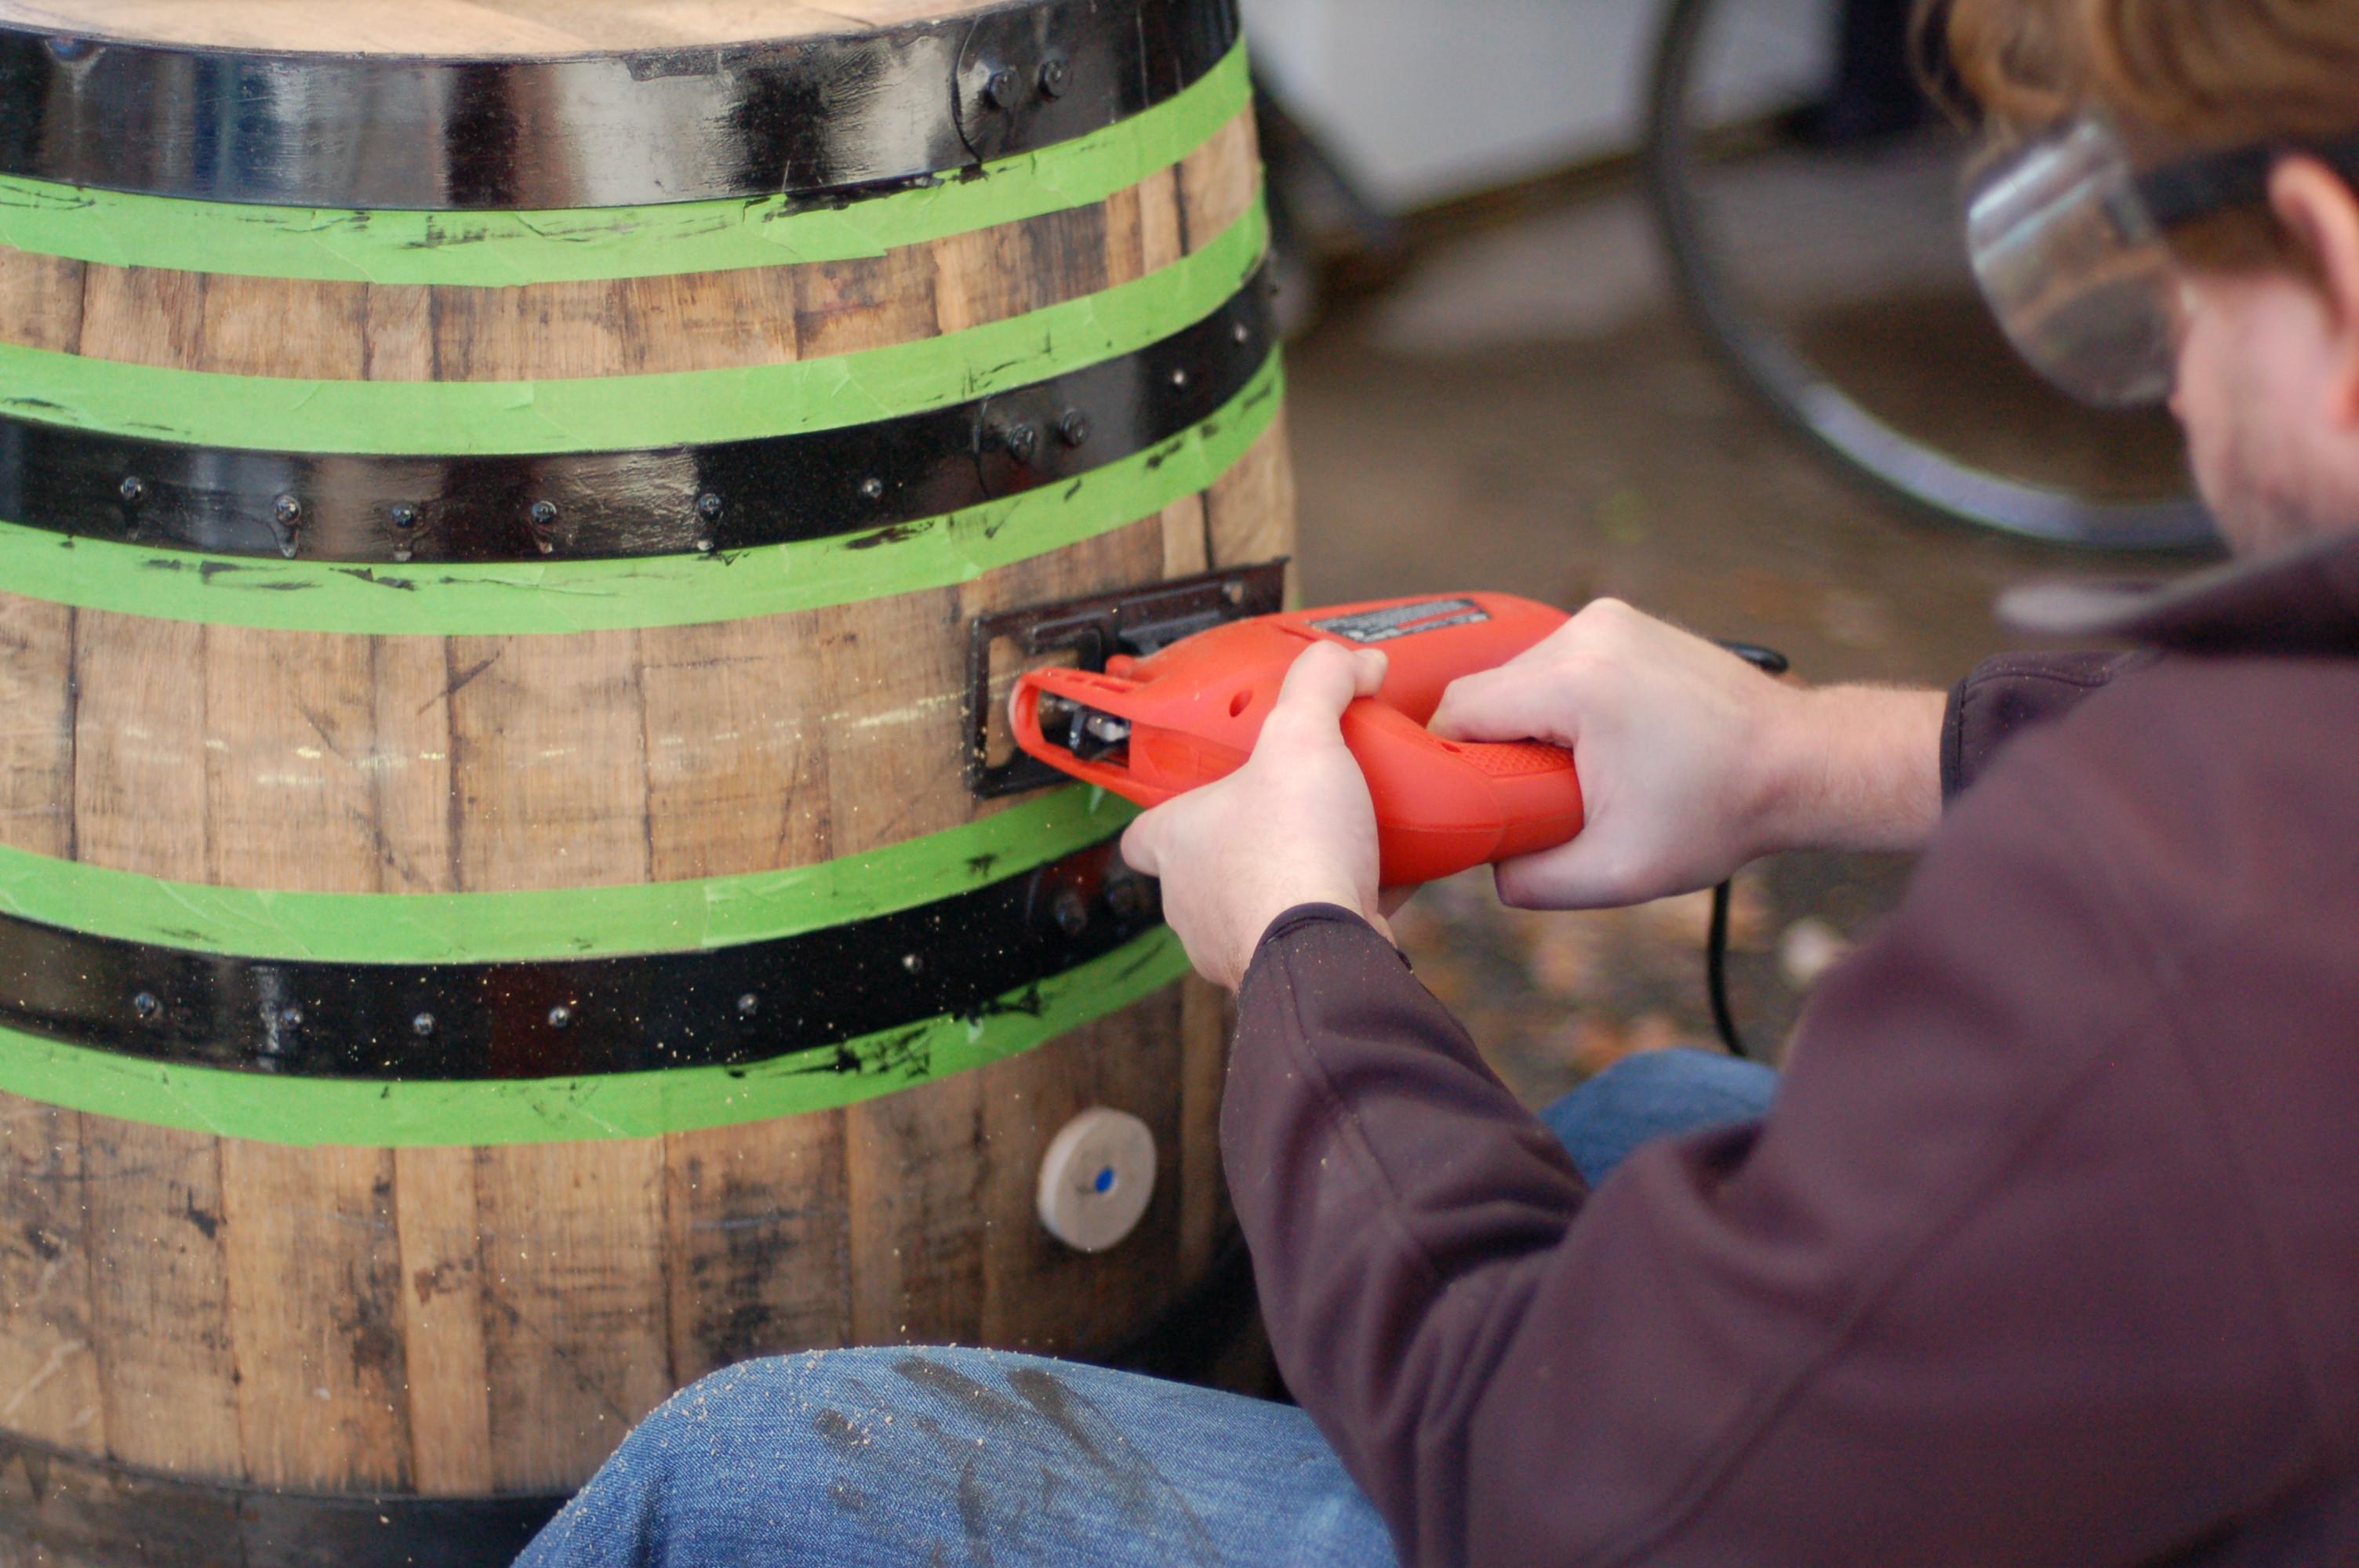 DIY Wooden Barrel  DIY Building a Bourbon Barrel Meat Smoker – A Ph D in